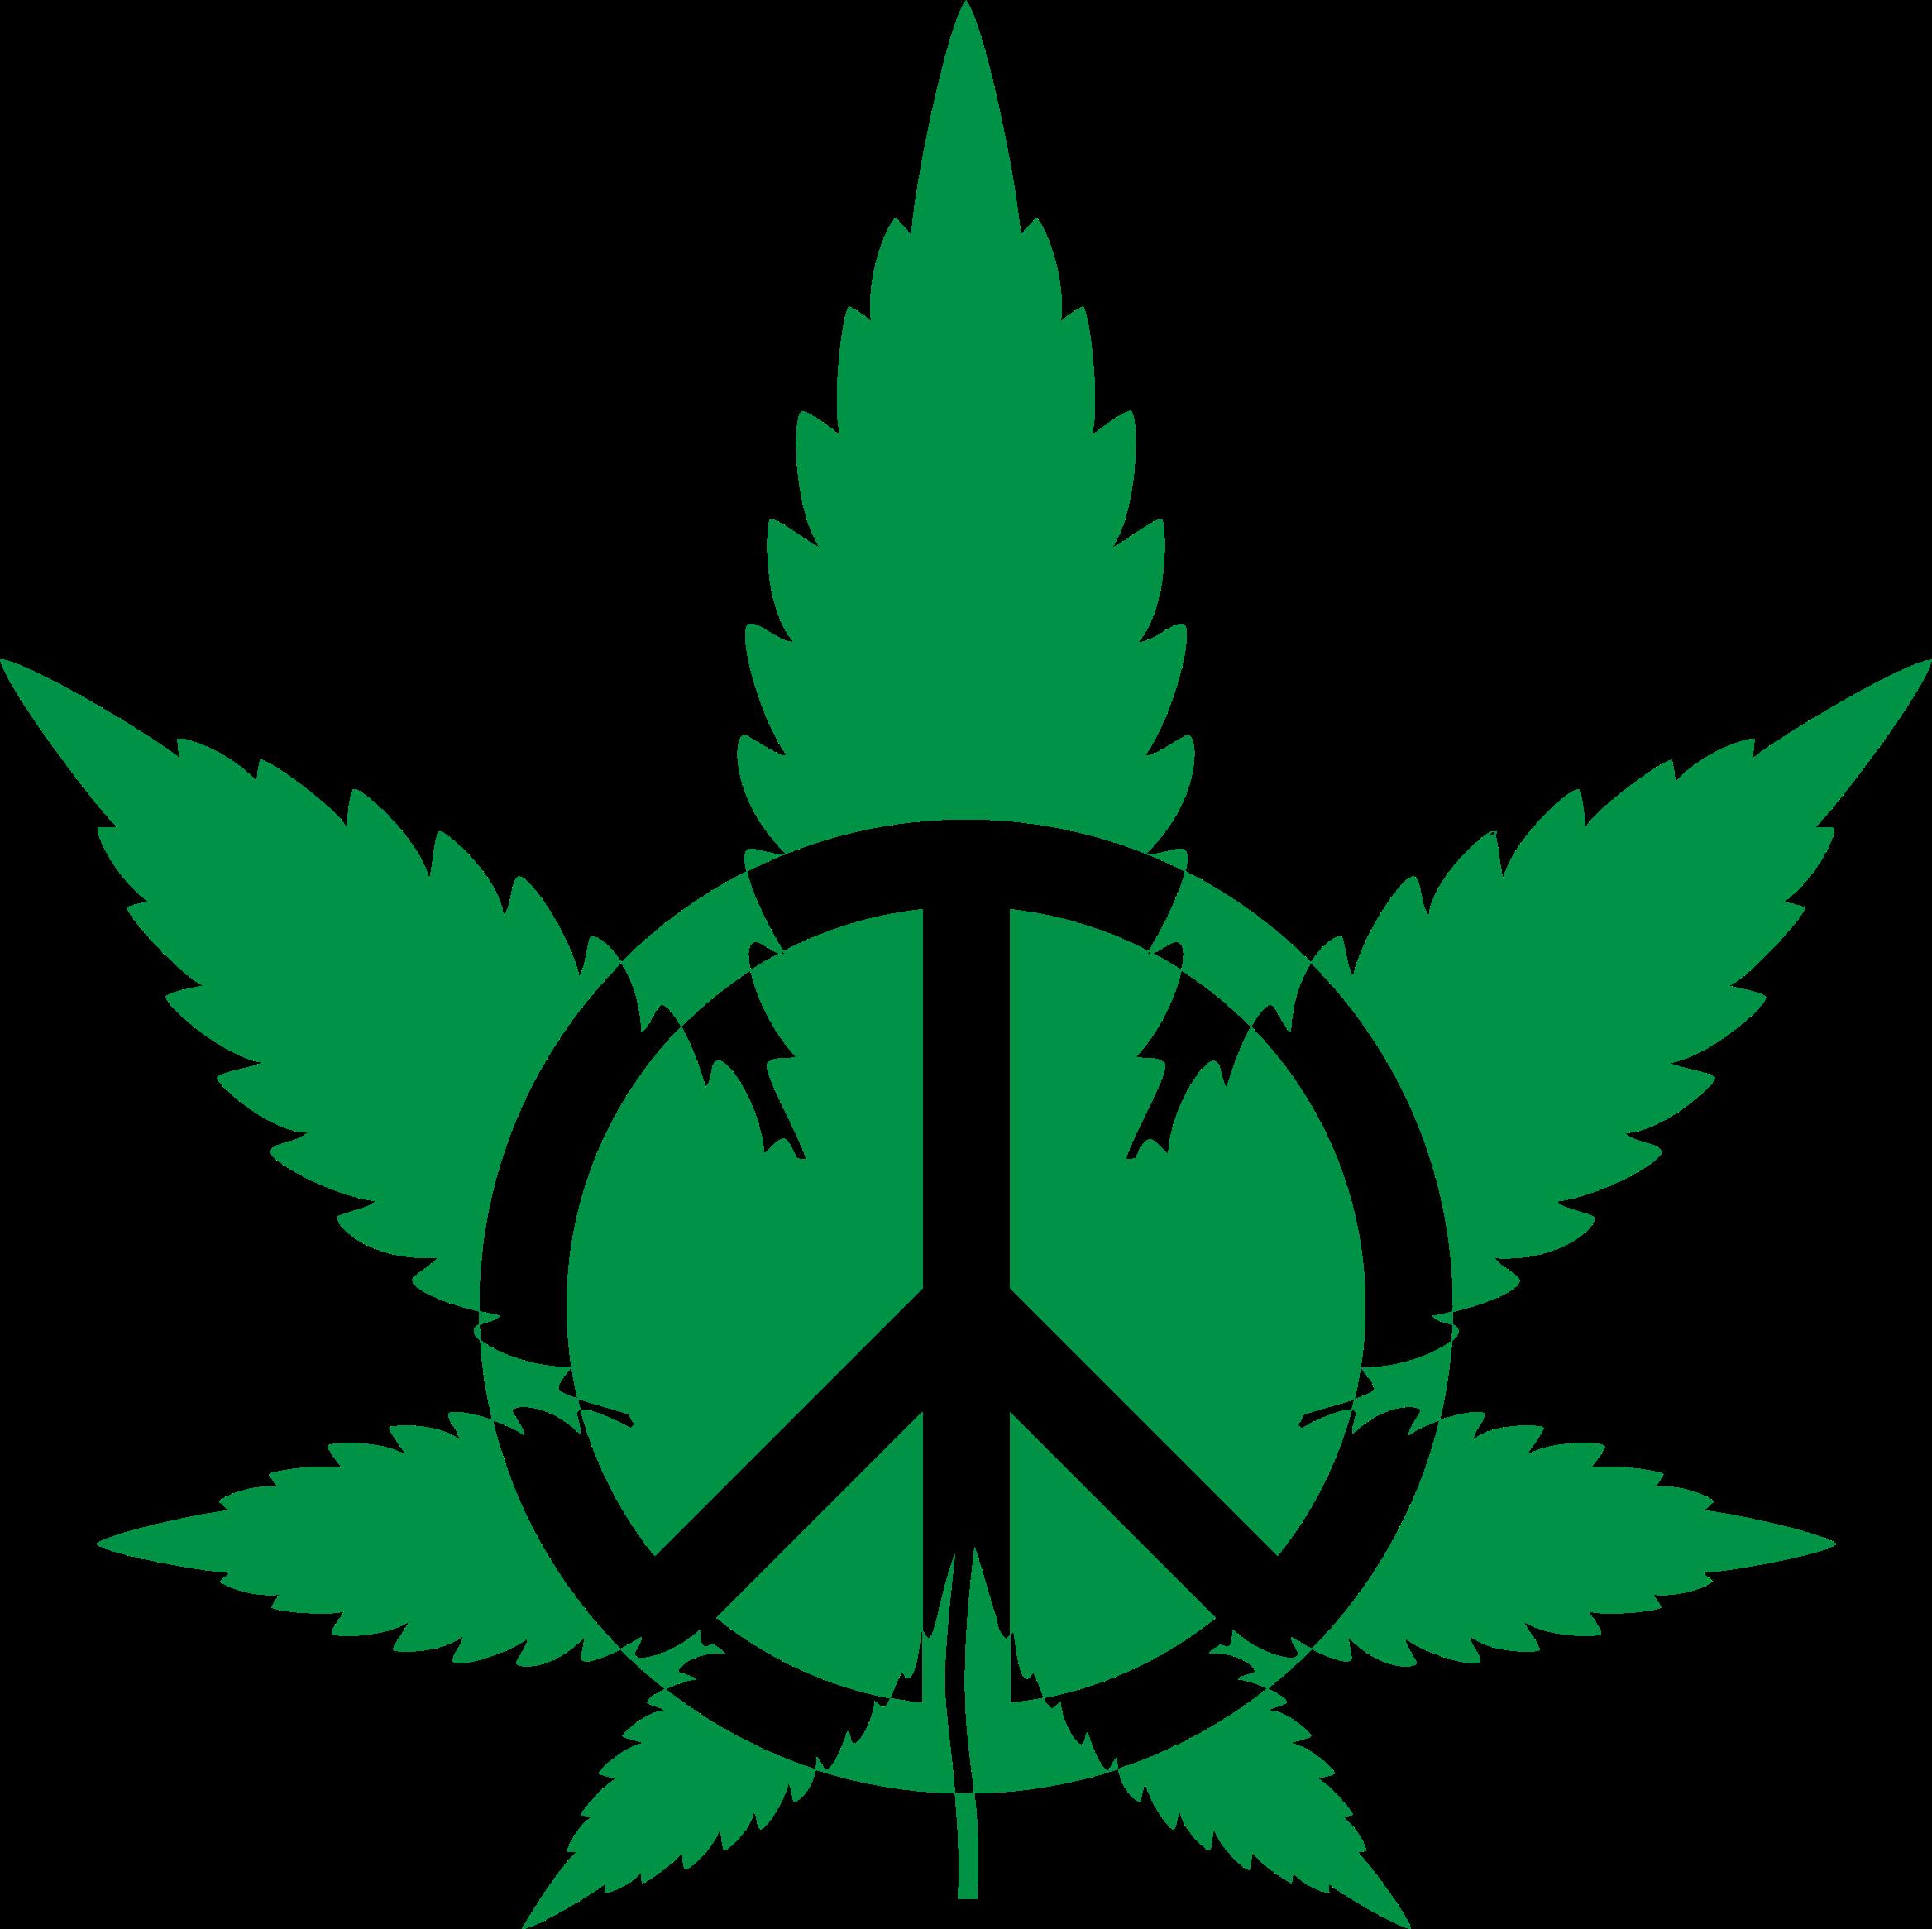 Peace big image png. Marijuana clipart pdf